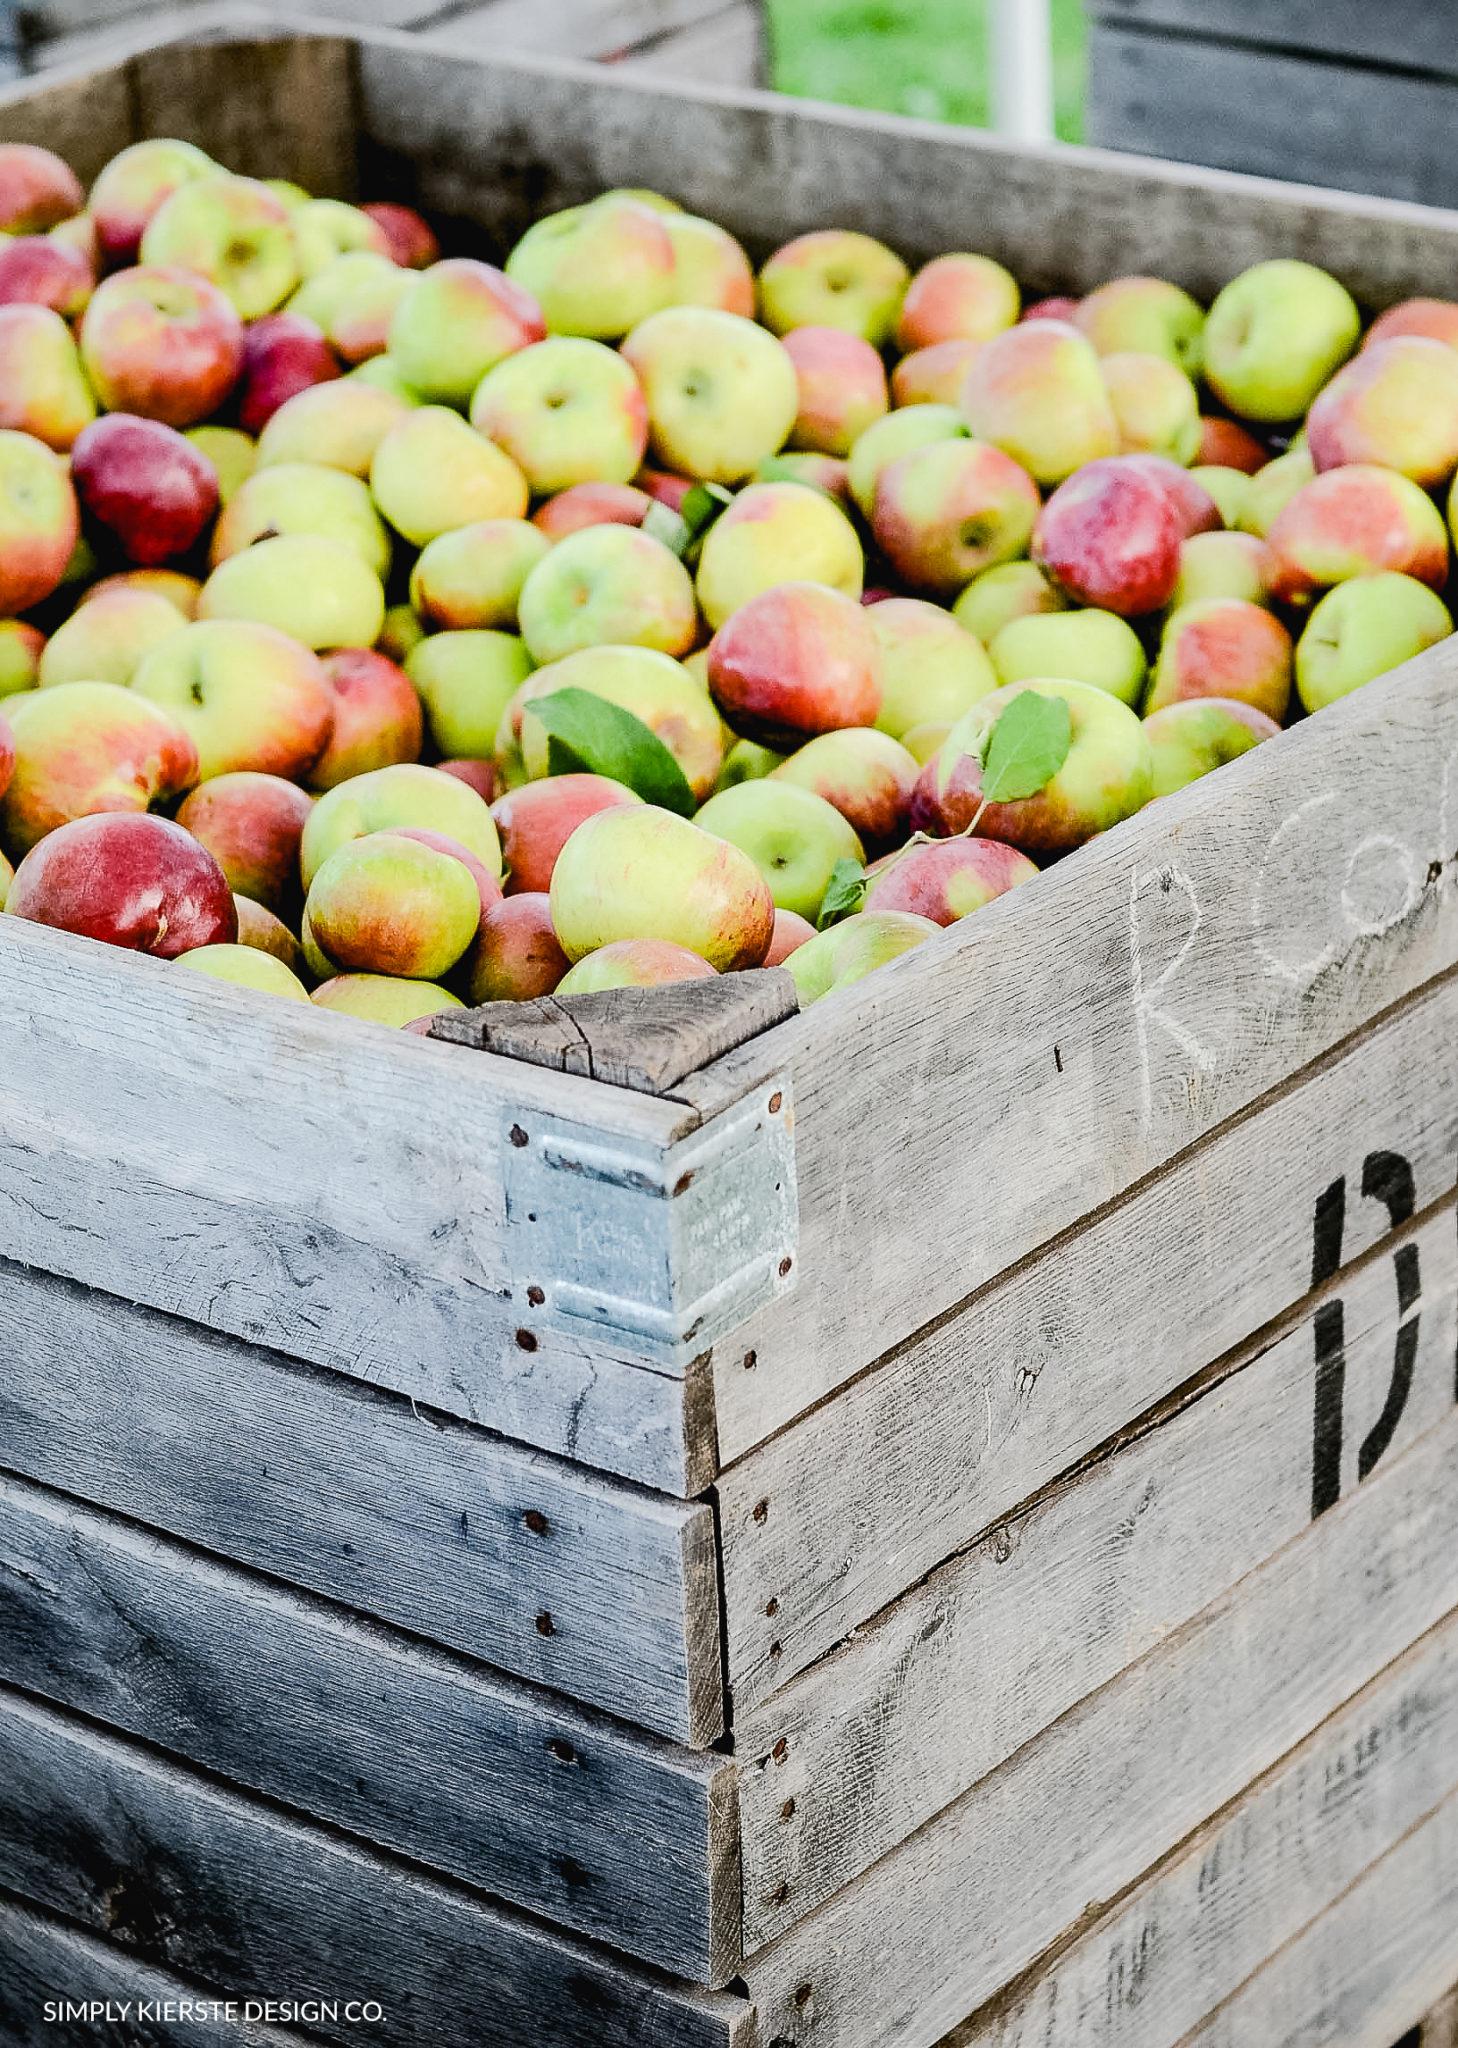 How to Make the Perfect Caramel Apples   Tips & Tricks   oldsaltfarm.com